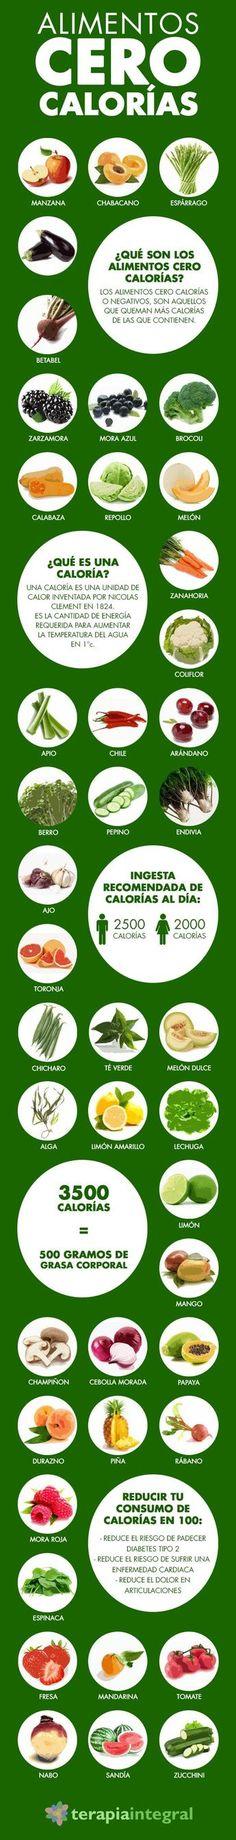 42 alimentos con cero calorías. #nutrición #salud #alimentación